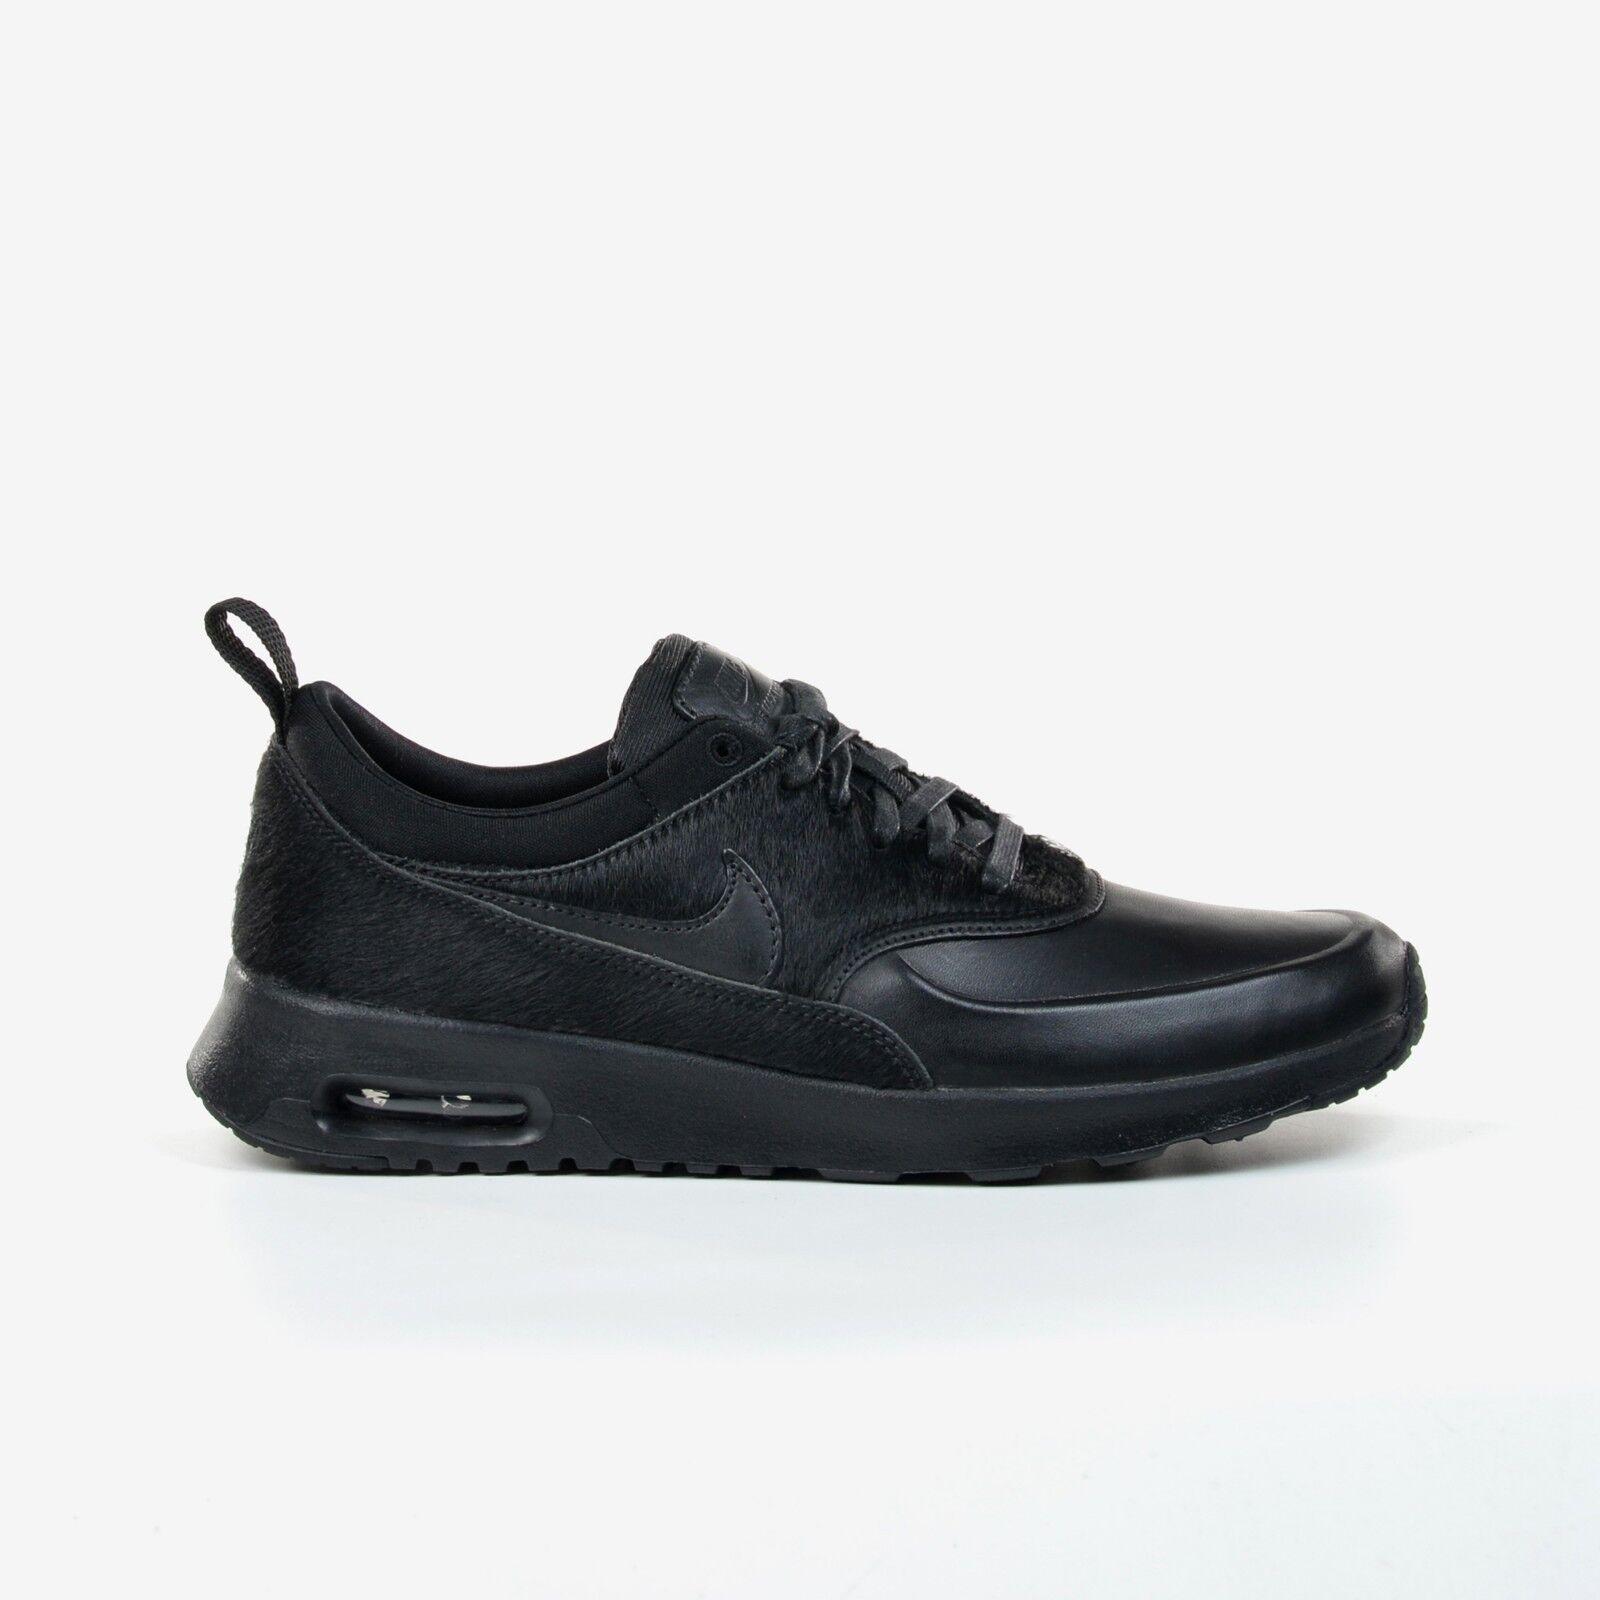 Nike Women's Air Max Thea Premium